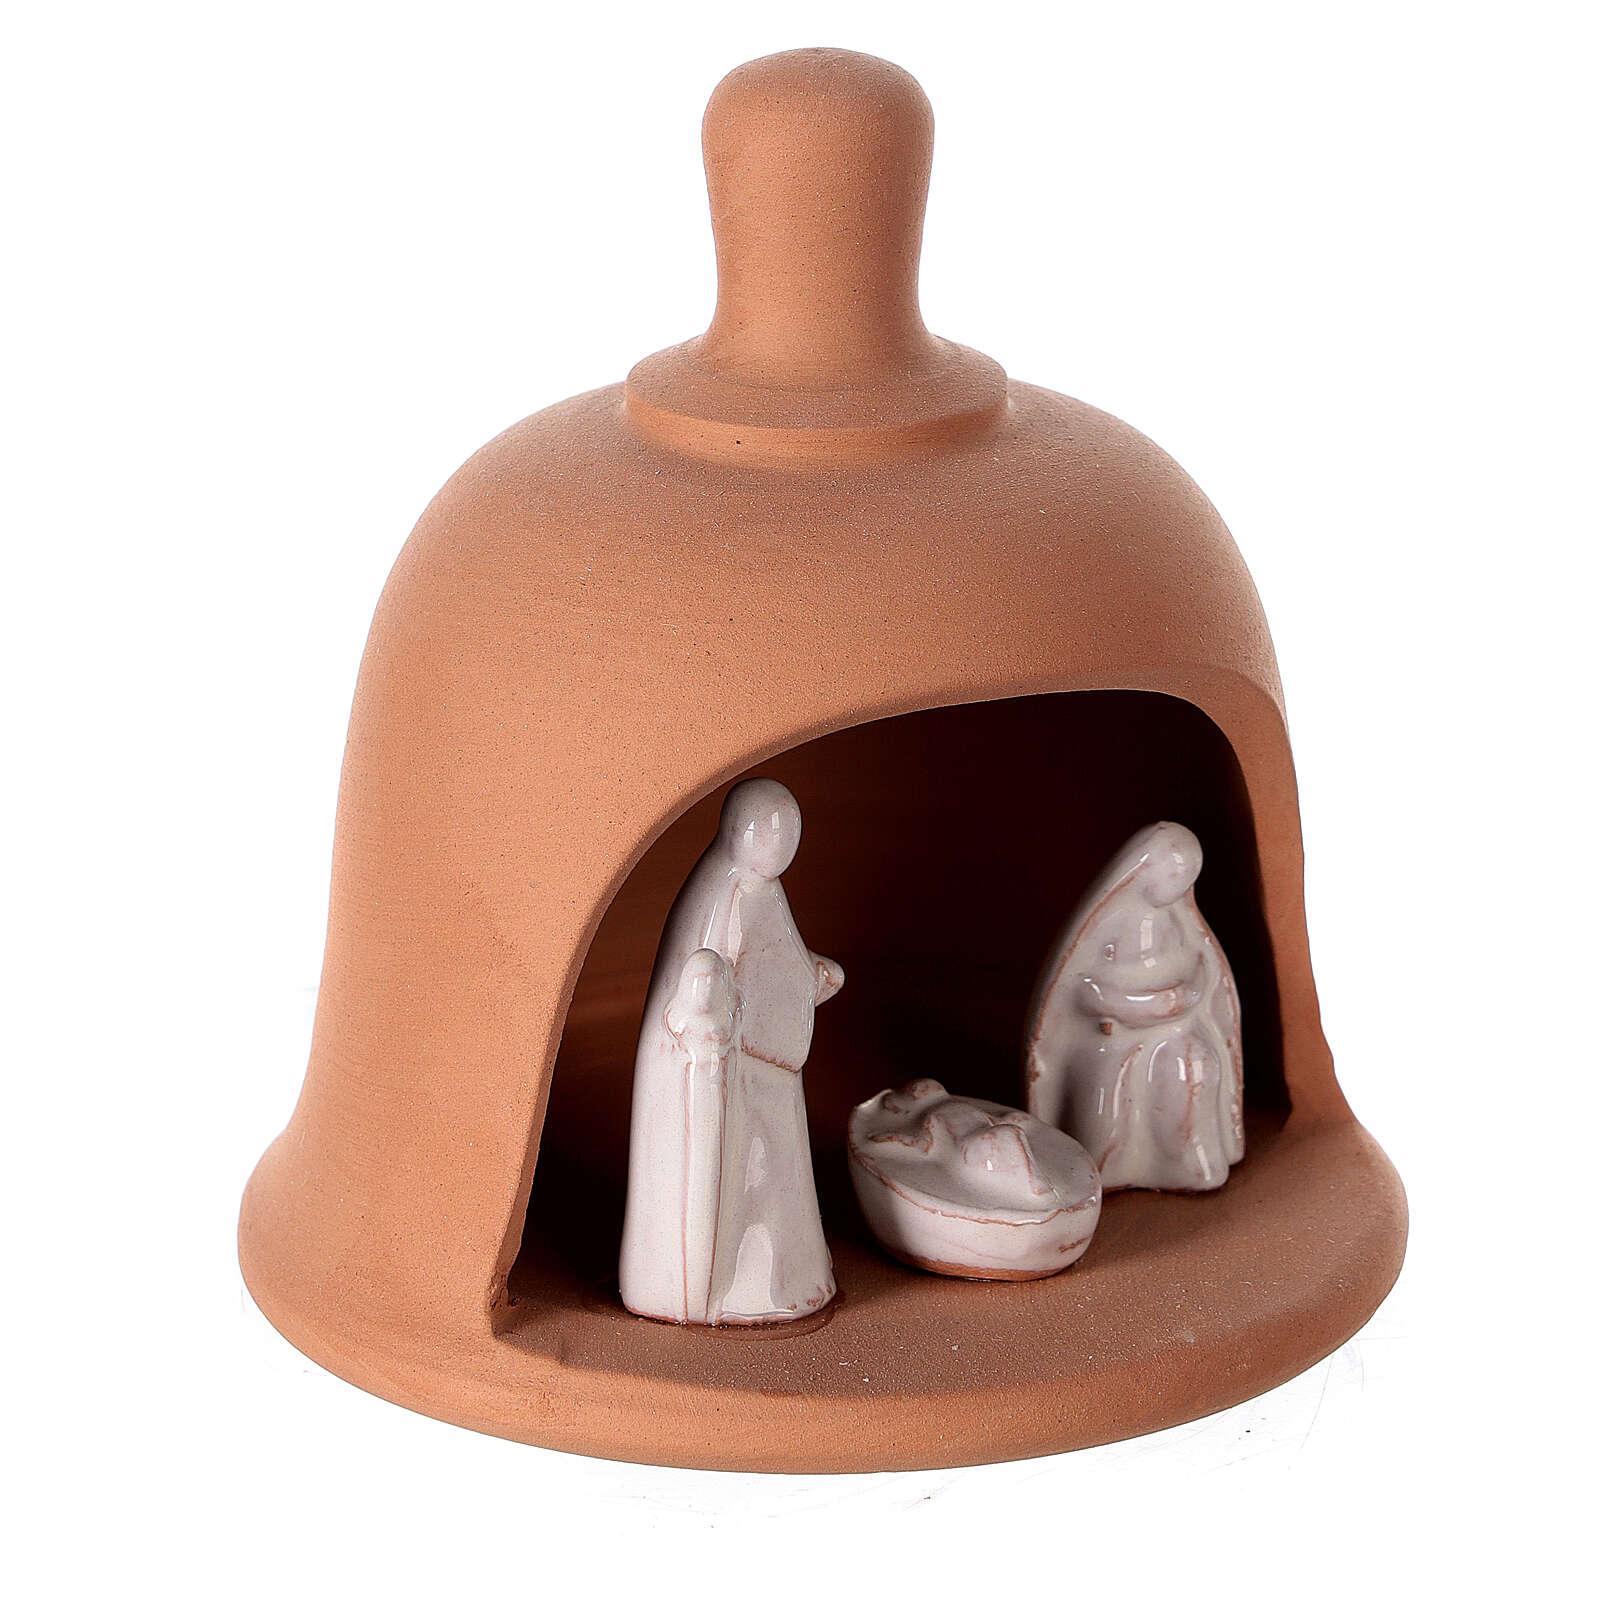 Clochette terre cuite naturelle Nativité blanche Deruta 10 cm 4